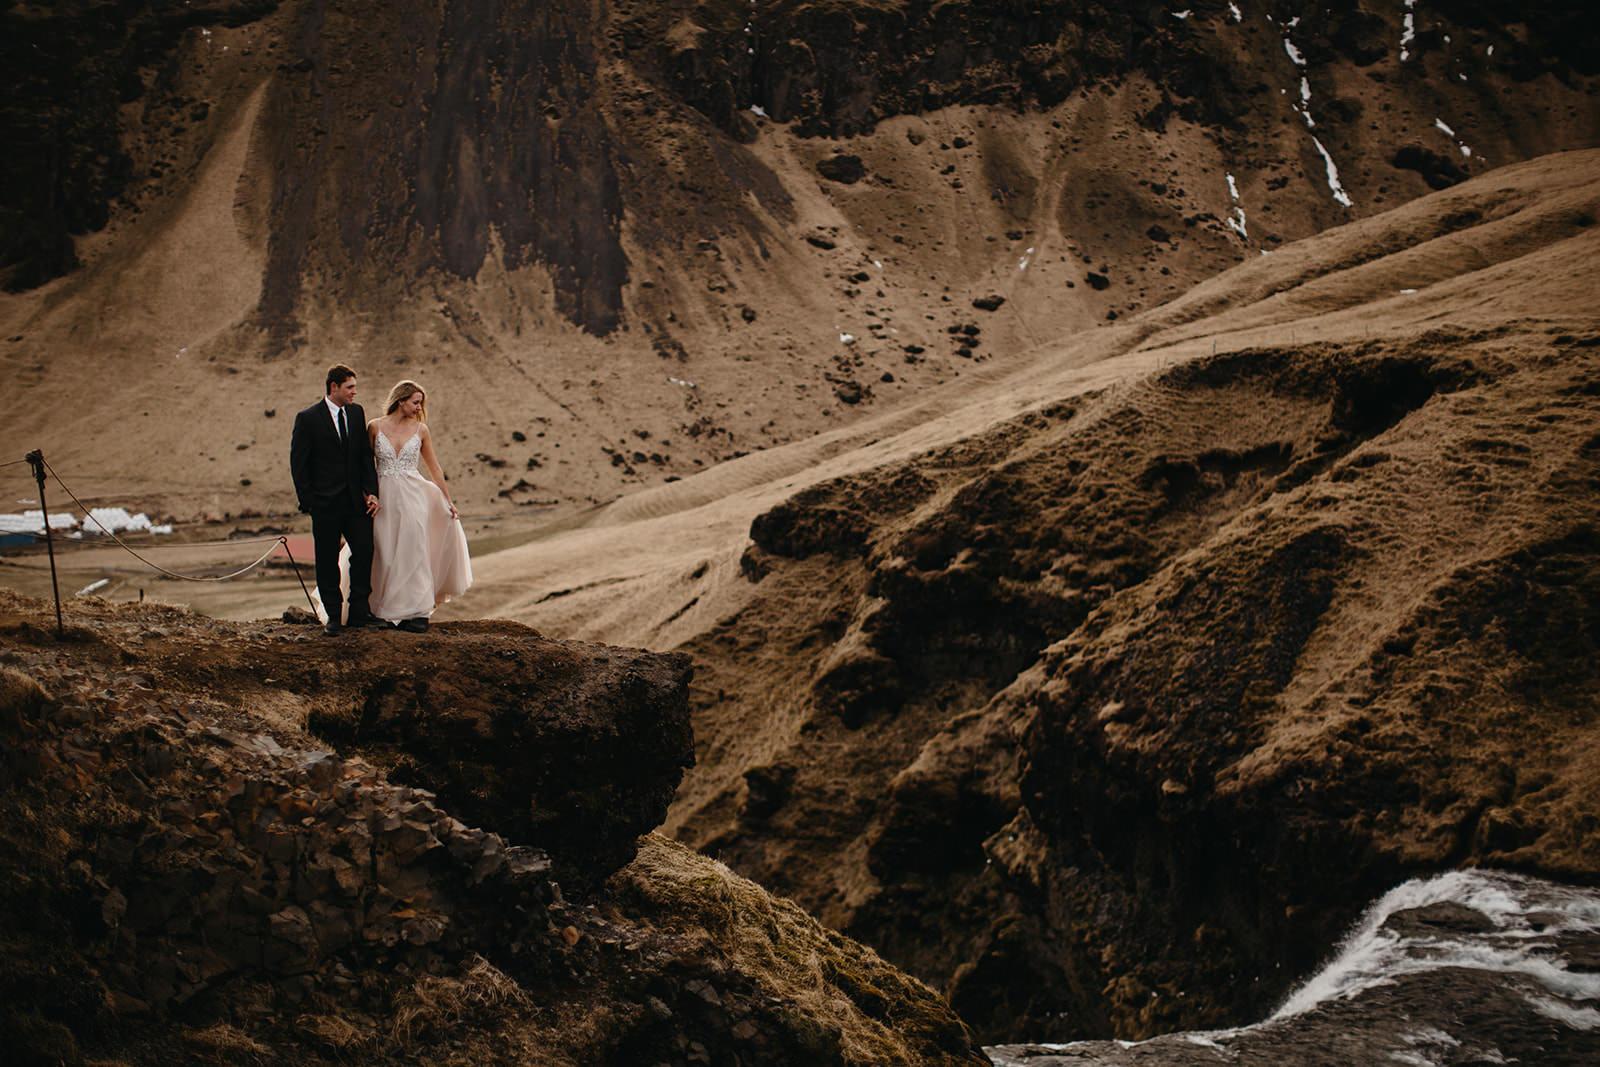 Icelandic Iceland Elopement Wedding Elope Photographer Eloping Reykjavík Vik Black Sand Beach Jökulsárlón Skogafoss Waterfall Vestrahorn Mountain Liz Osban Photography Destination 92.jpg